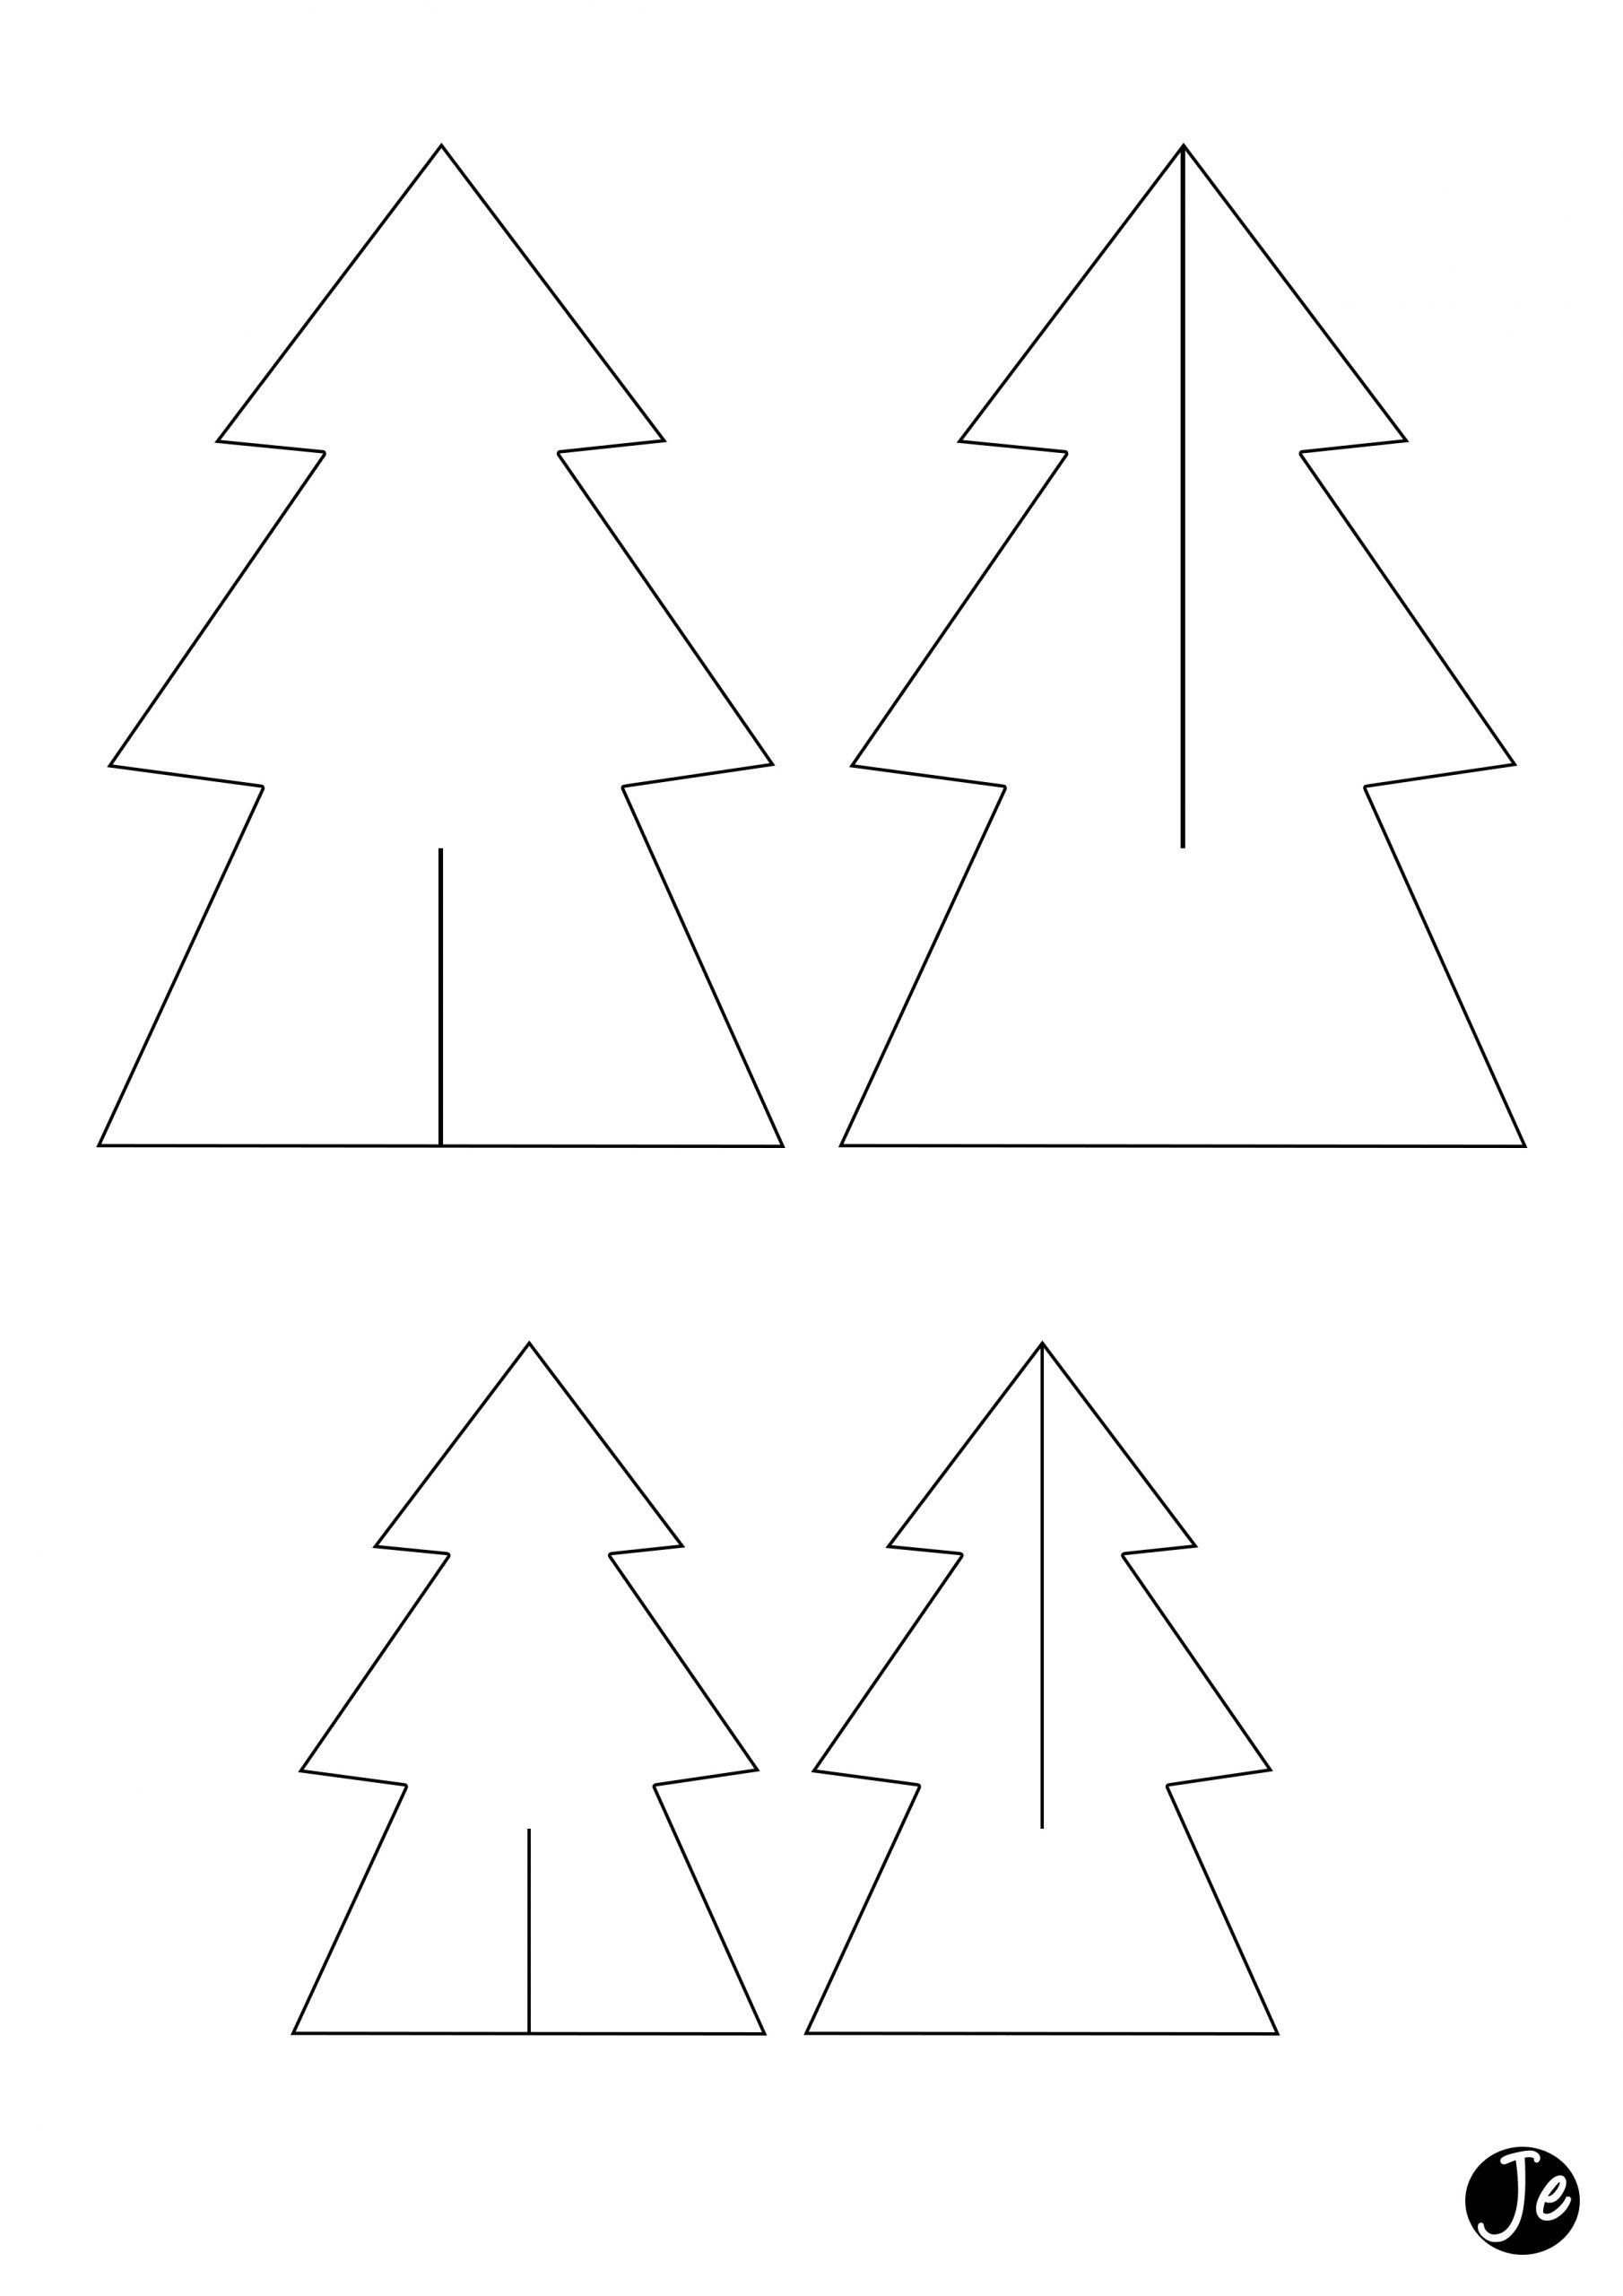 Sapins De Noël En Carton | Jouonsensemble dedans Gabarit Sapin De Noel